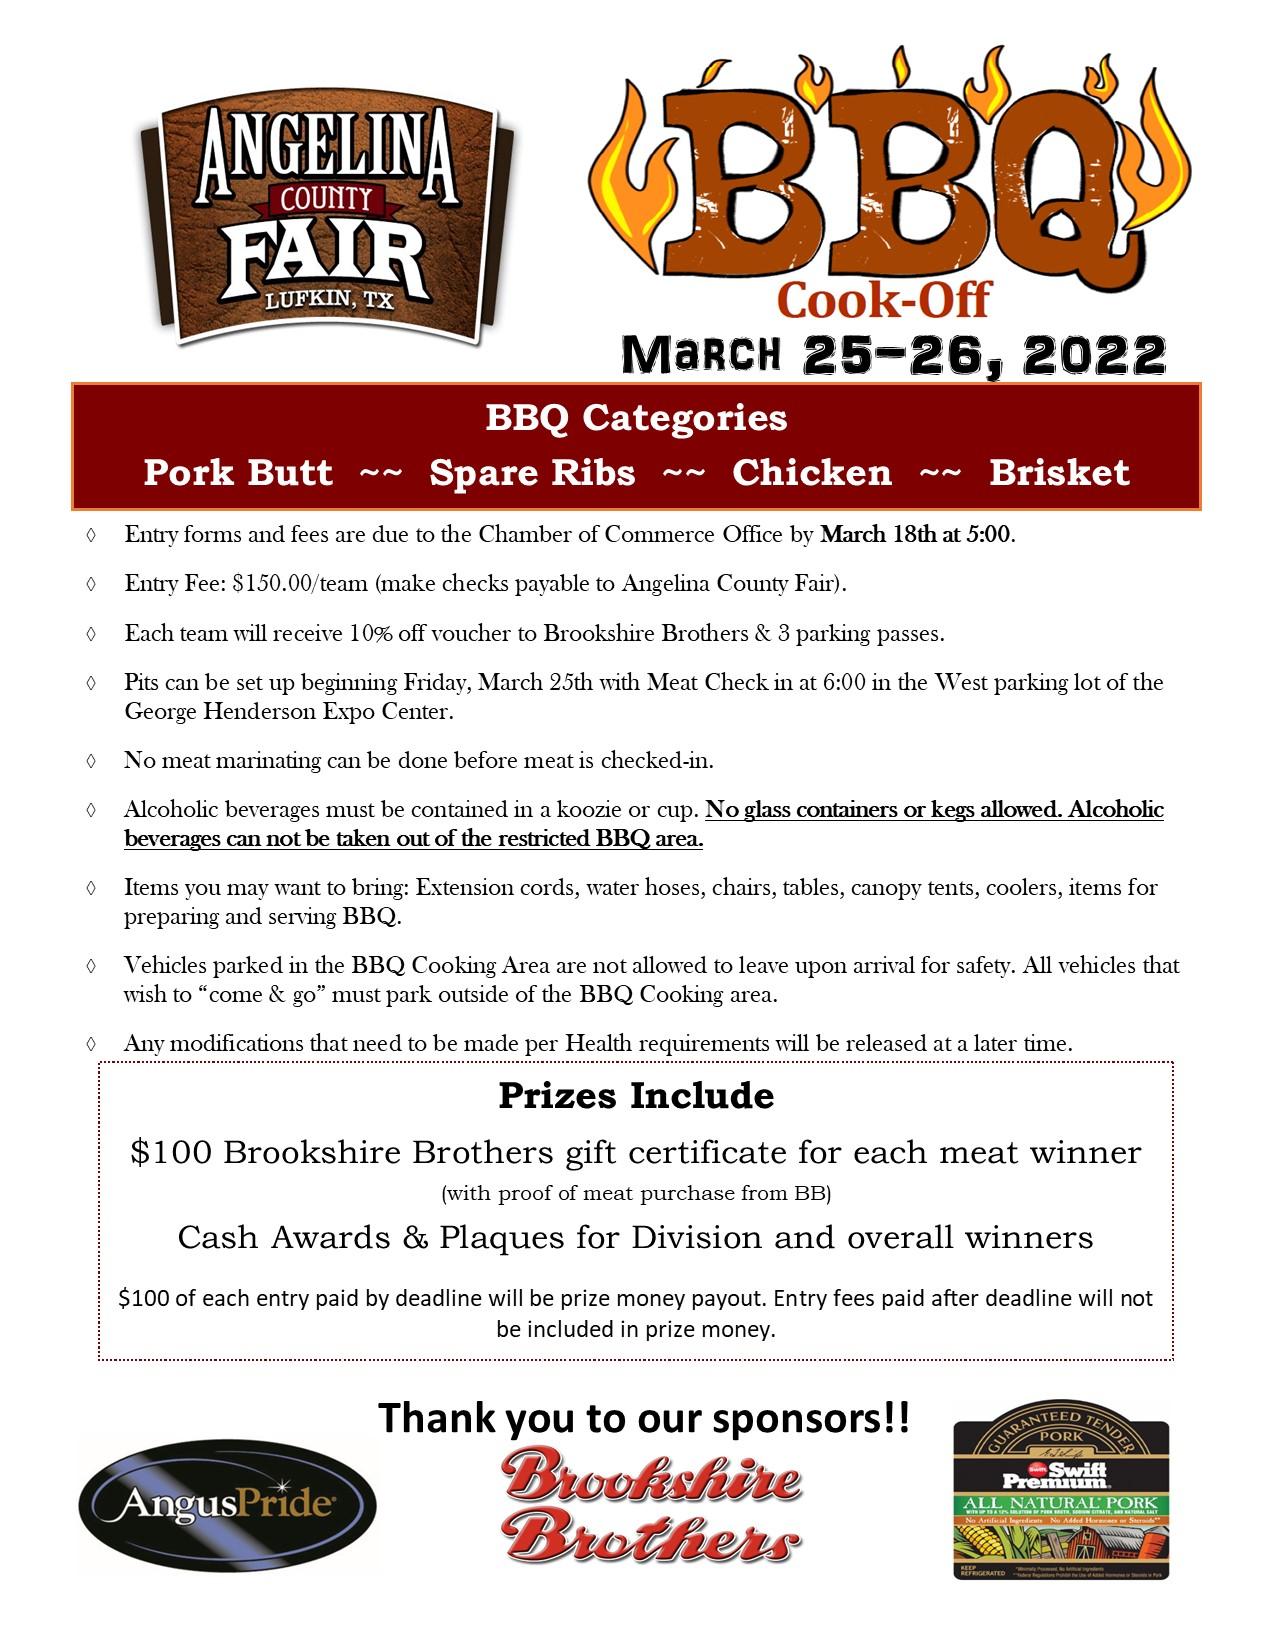 BBQ cookoff registration